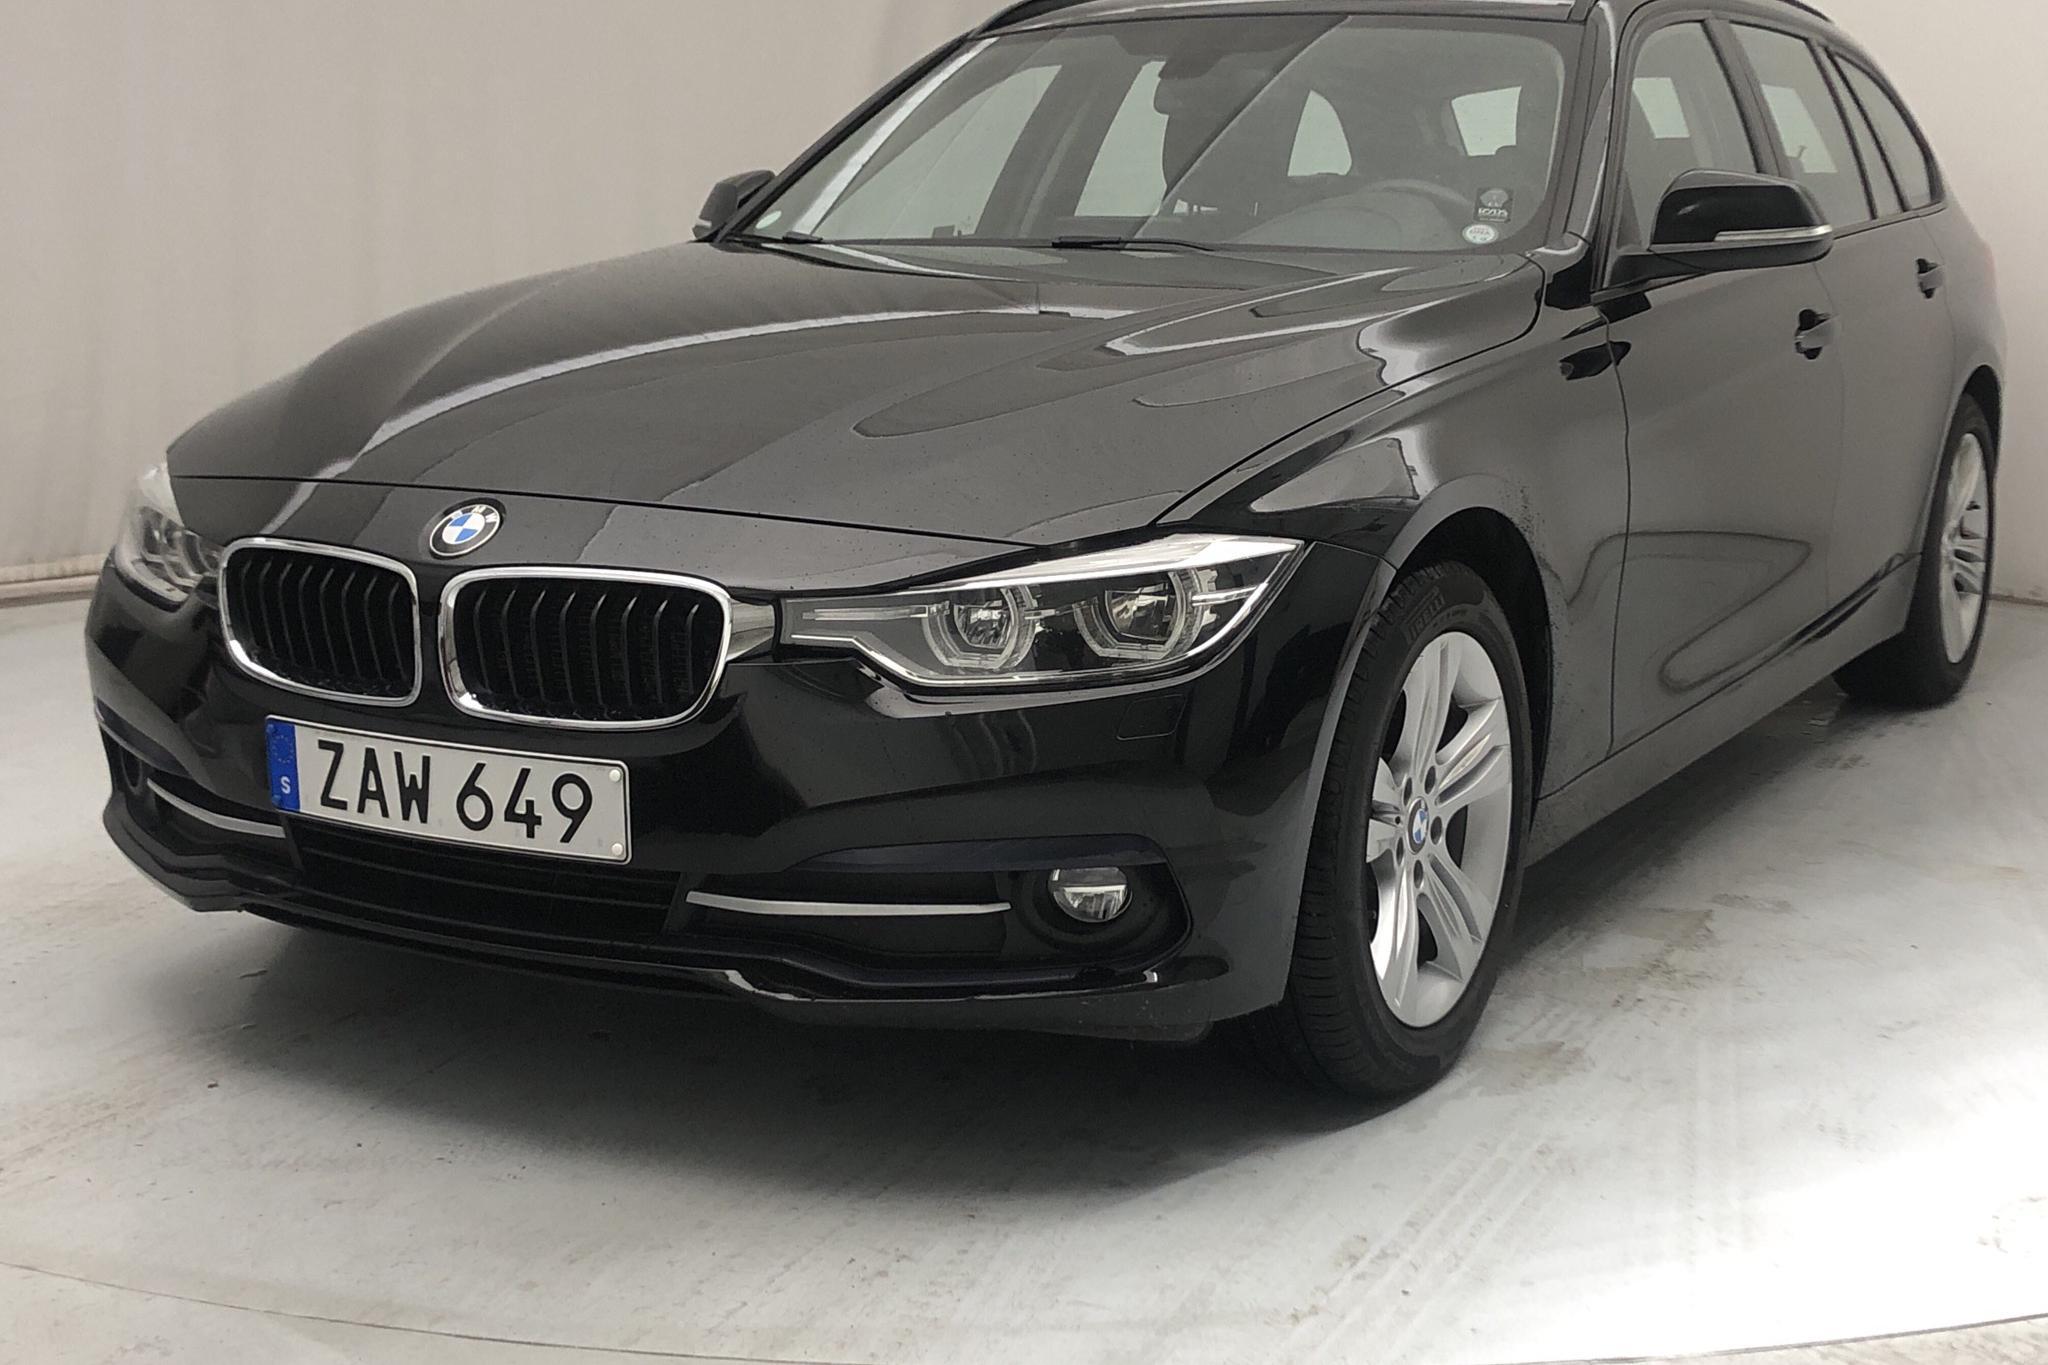 BMW 318d Touring, F31 (150hk) - 81 890 km - Automatic - black - 2018